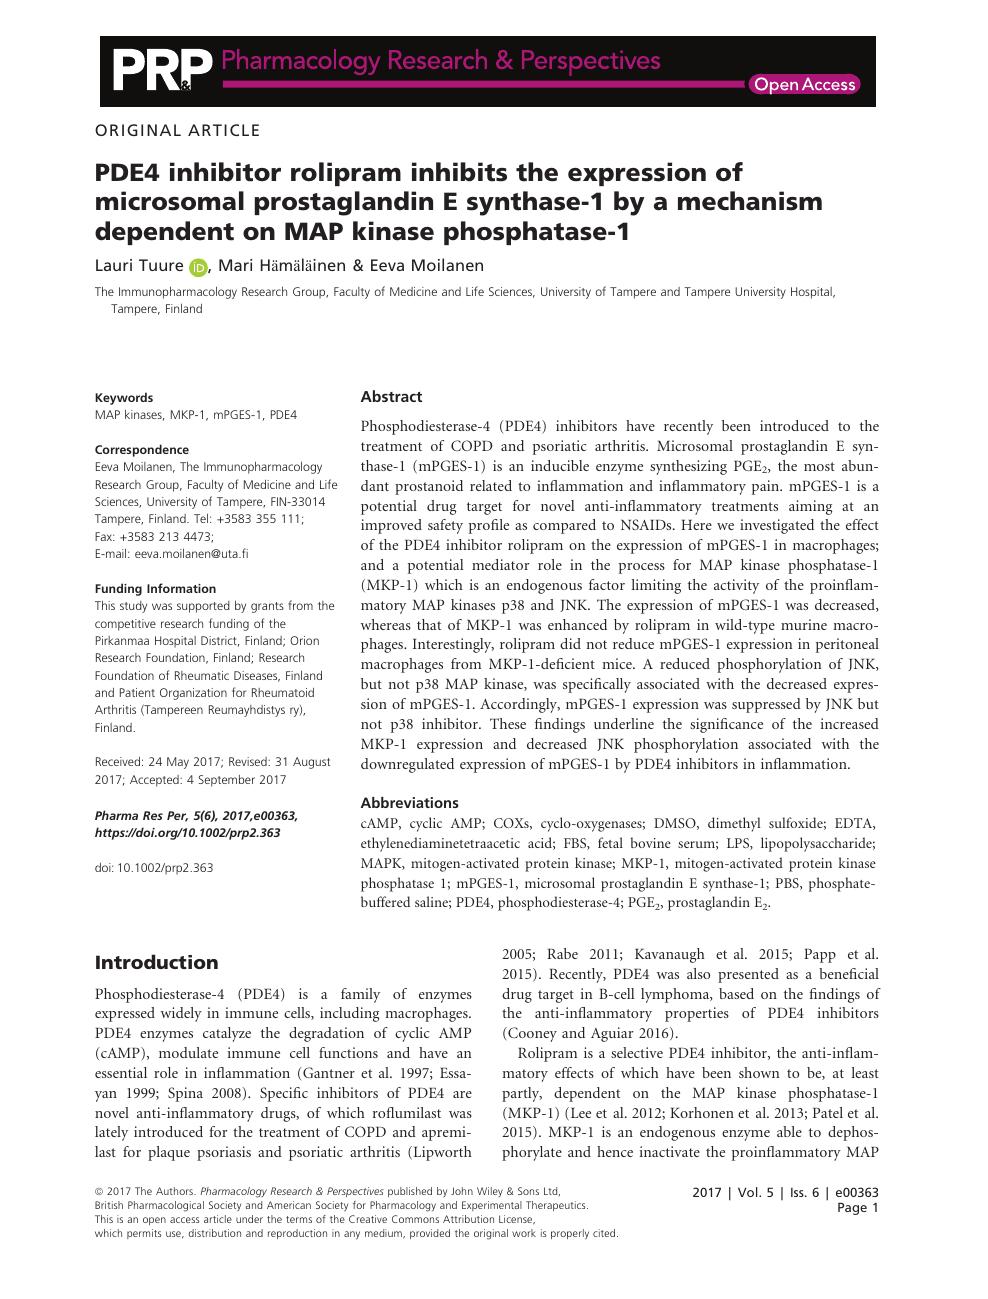 PDE4 inhibitor rolipram inhibits the expression of ... on